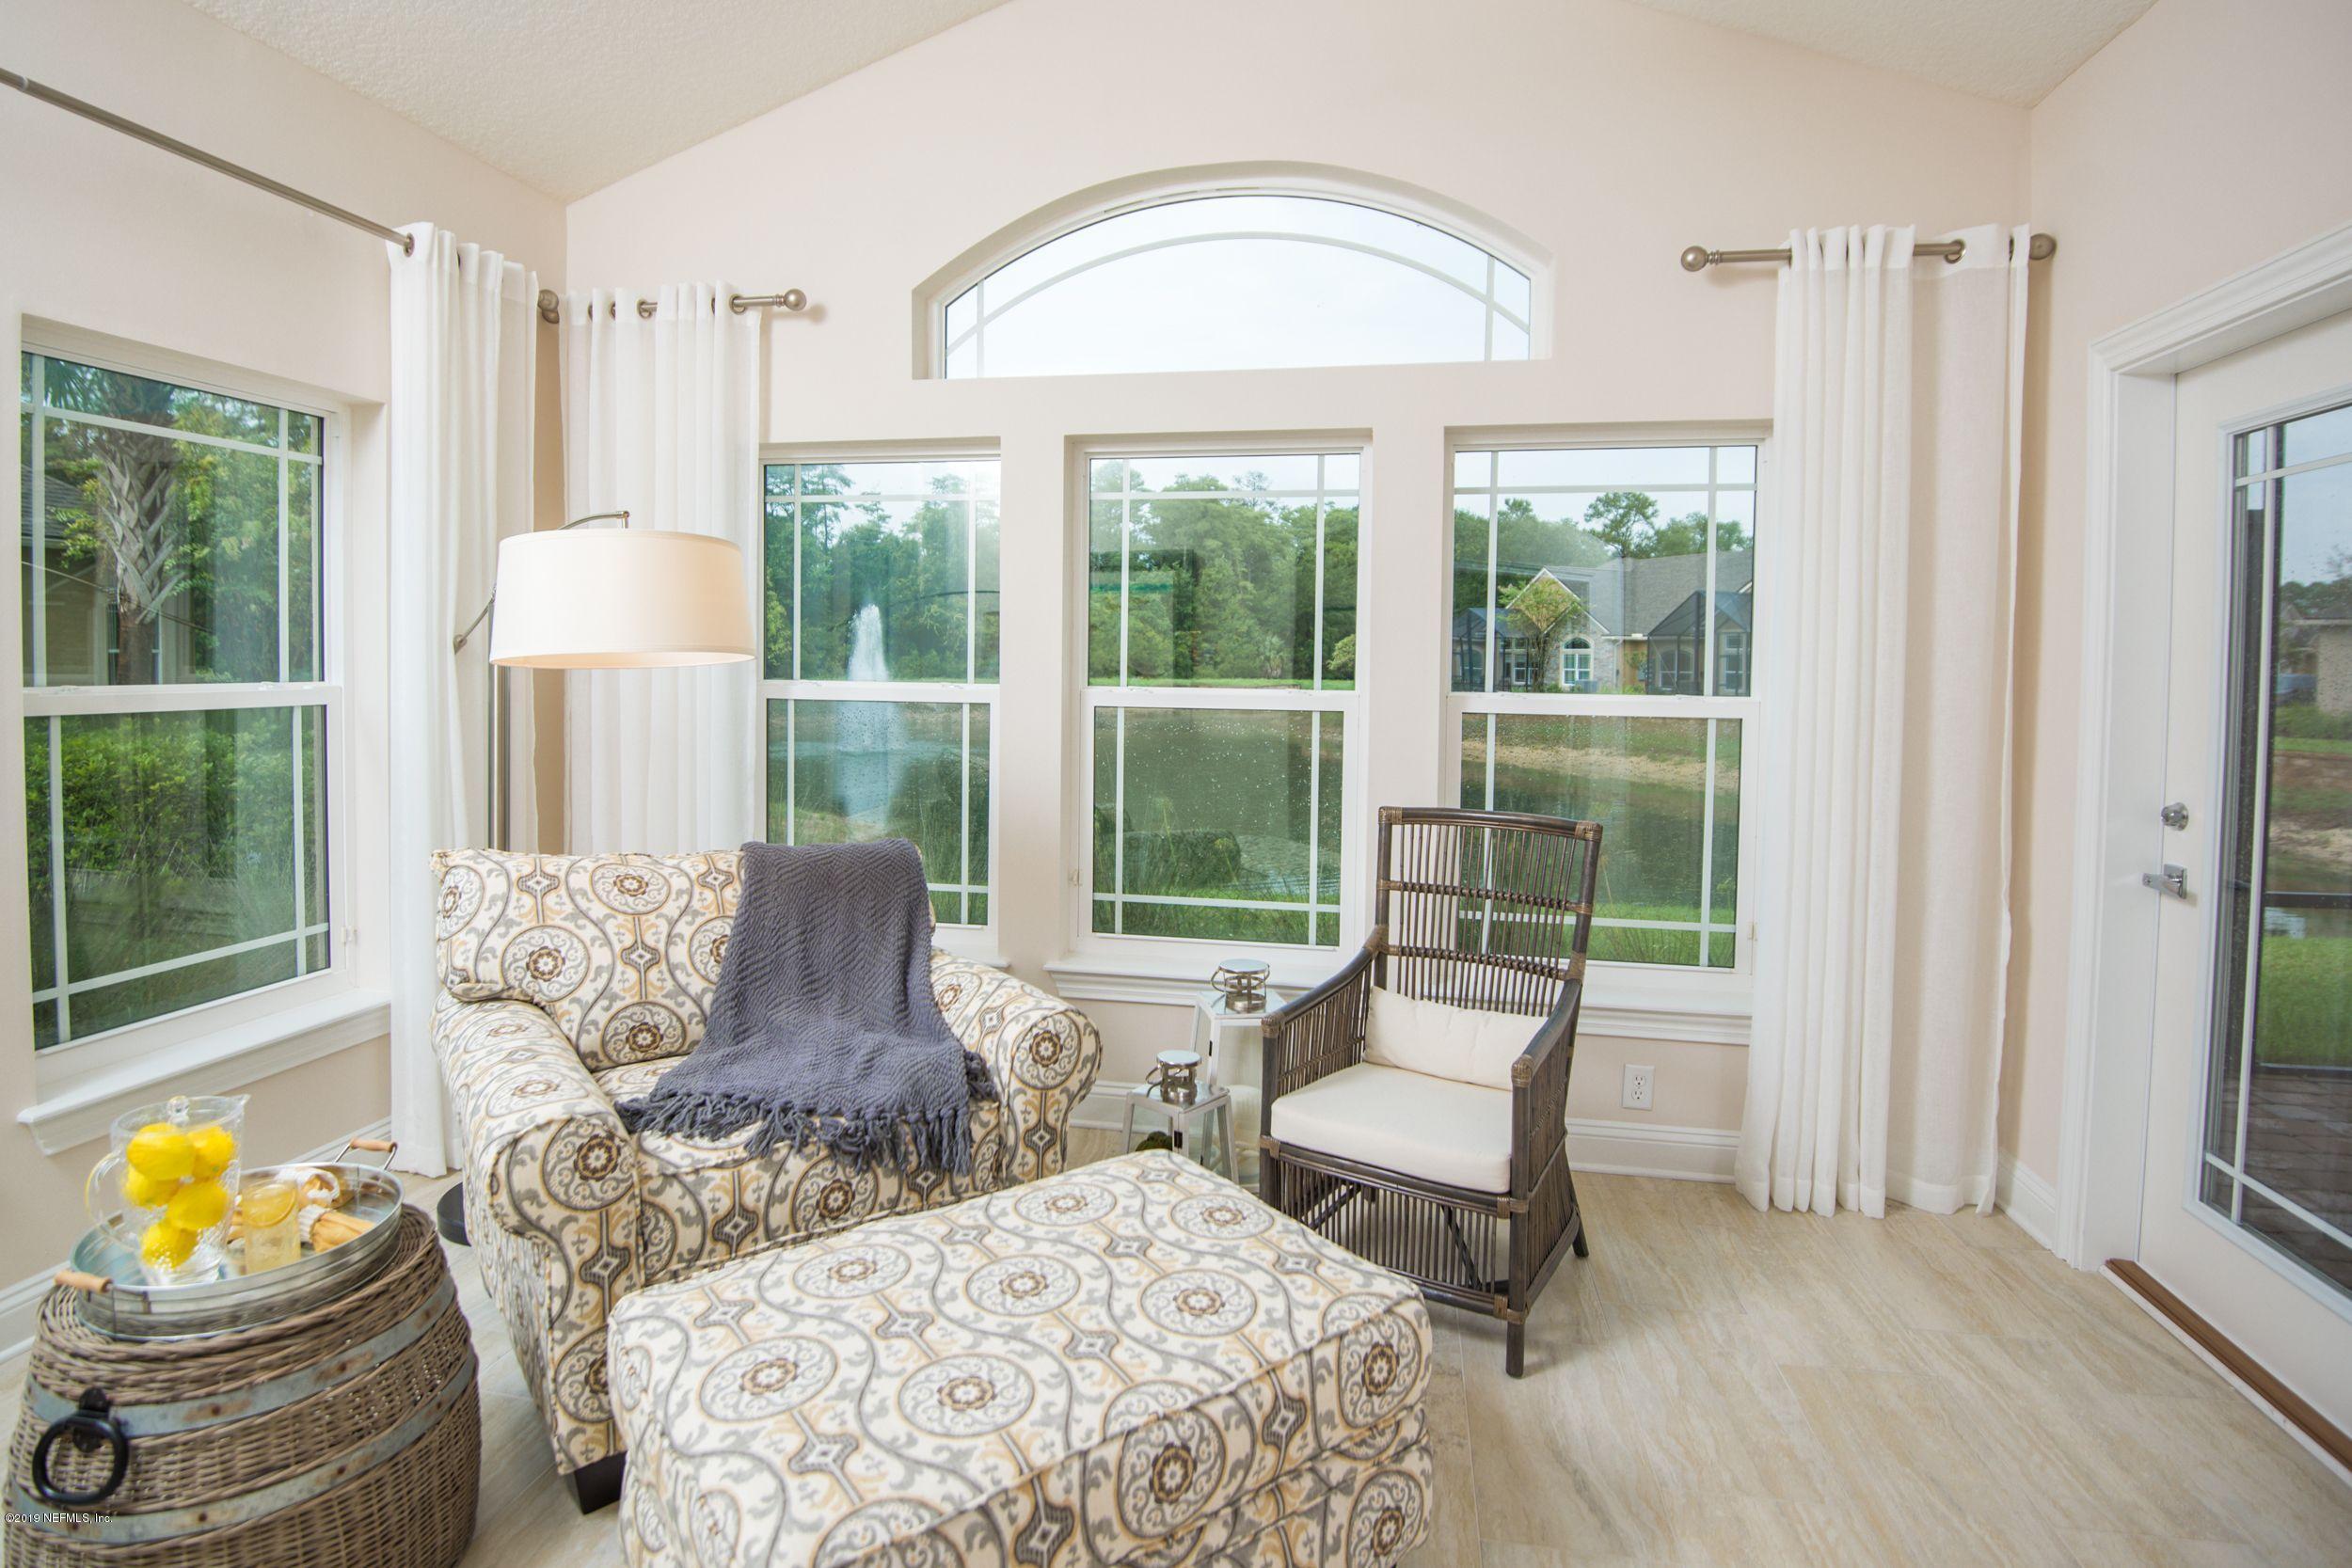 42 UTINA, ST AUGUSTINE, FLORIDA 32084, 2 Bedrooms Bedrooms, ,2 BathroomsBathrooms,Condo,For sale,UTINA,994523